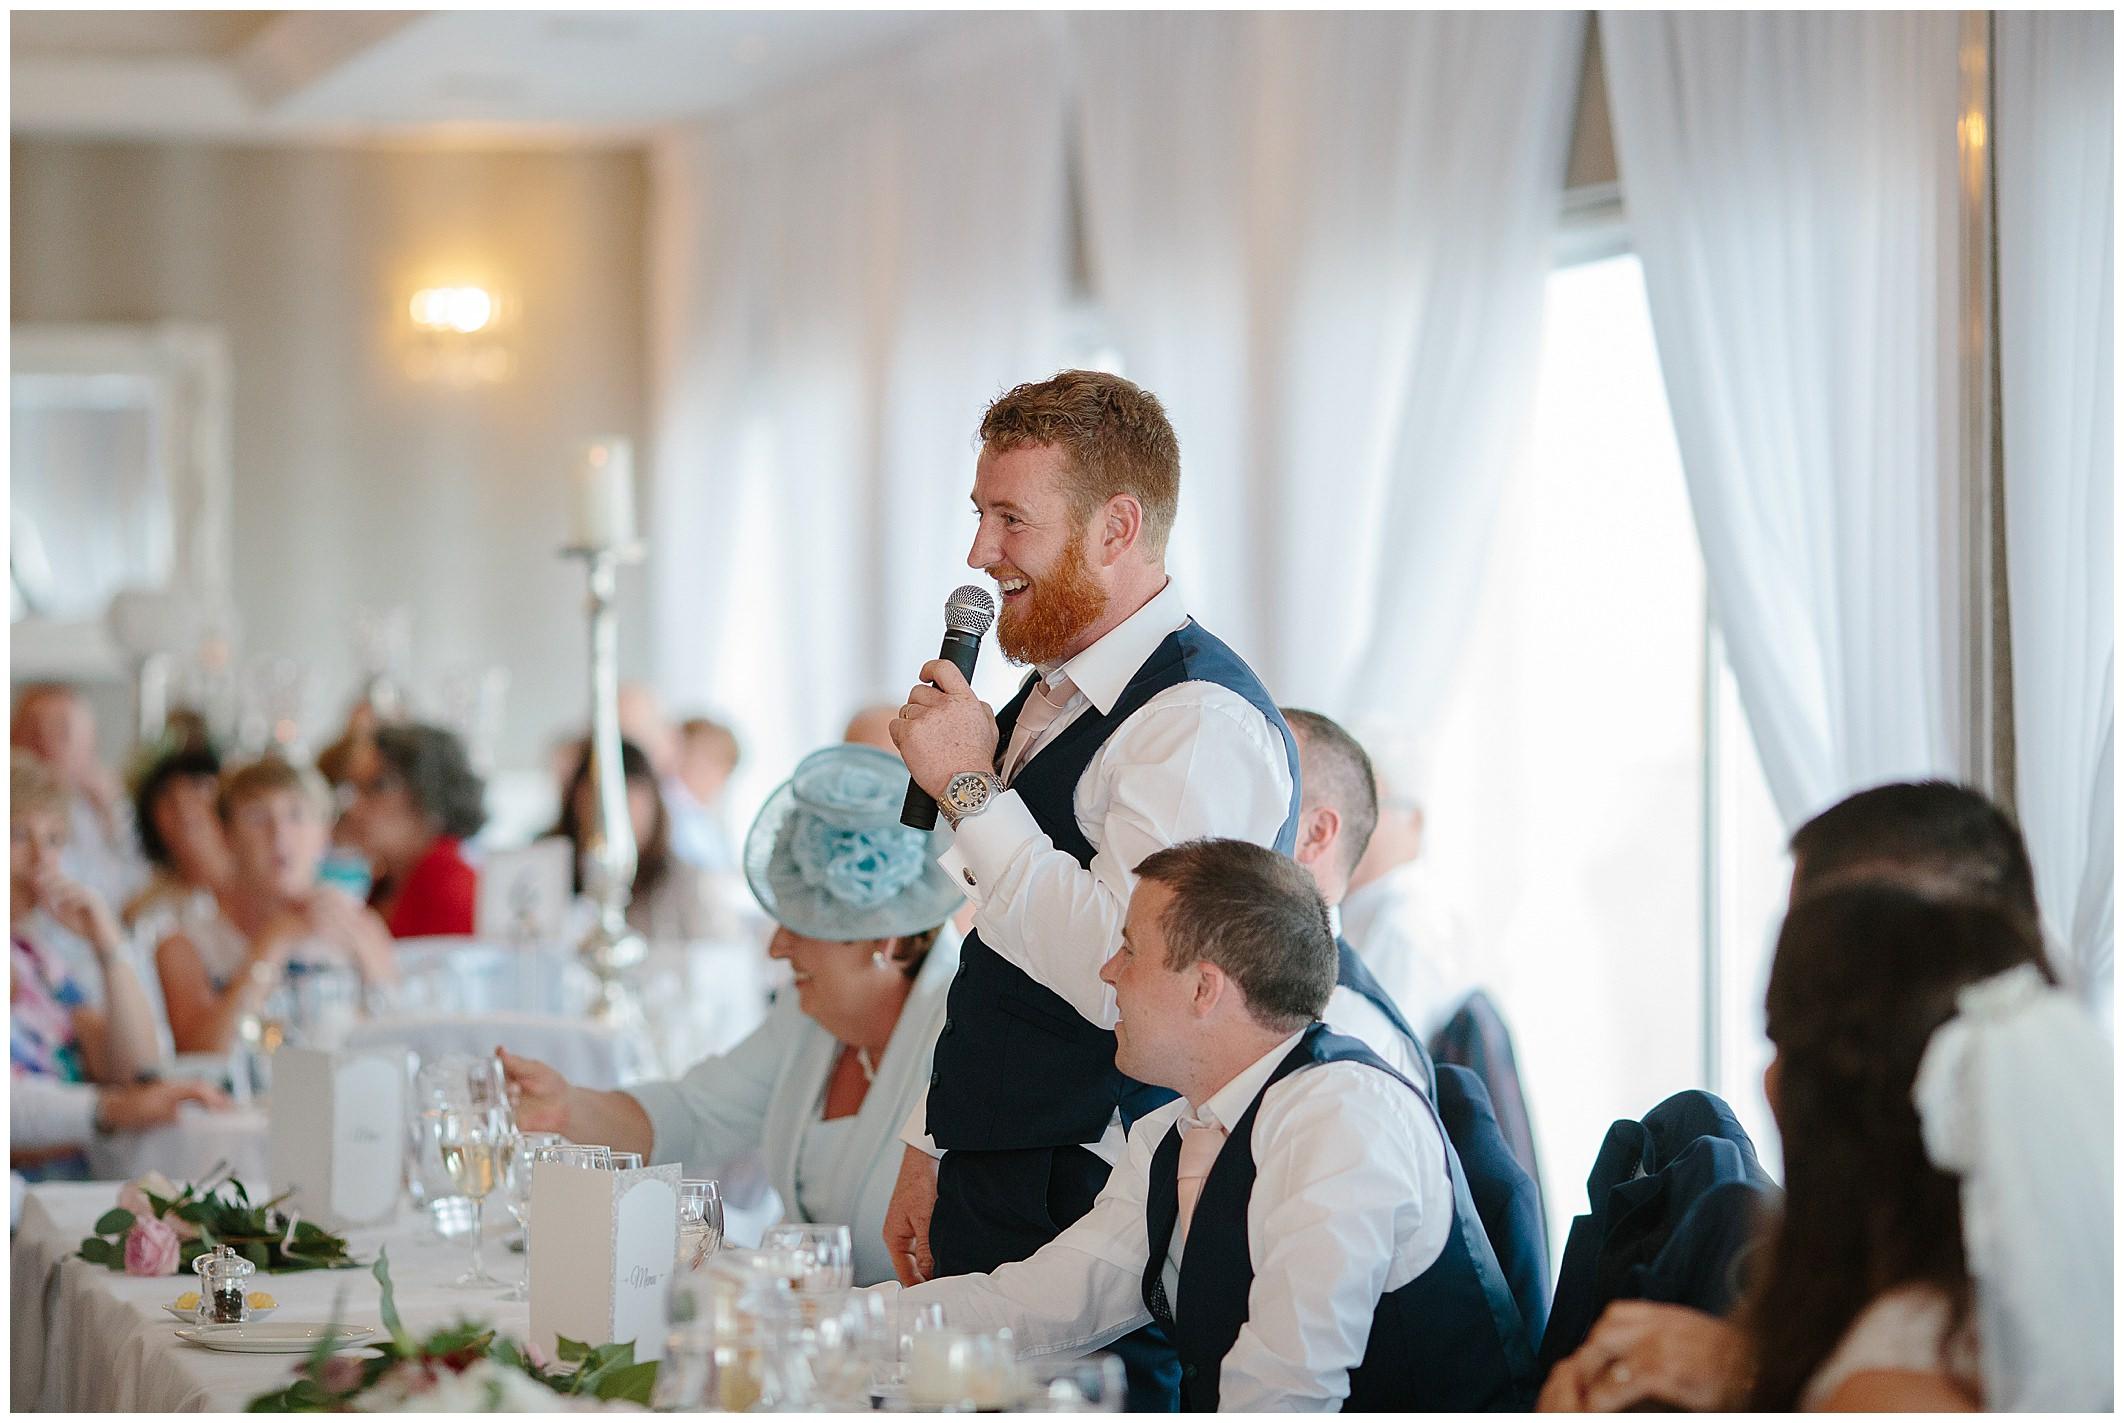 redcastle-hotel-wedding-karen-brian-jude-browne-photography-124.jpg